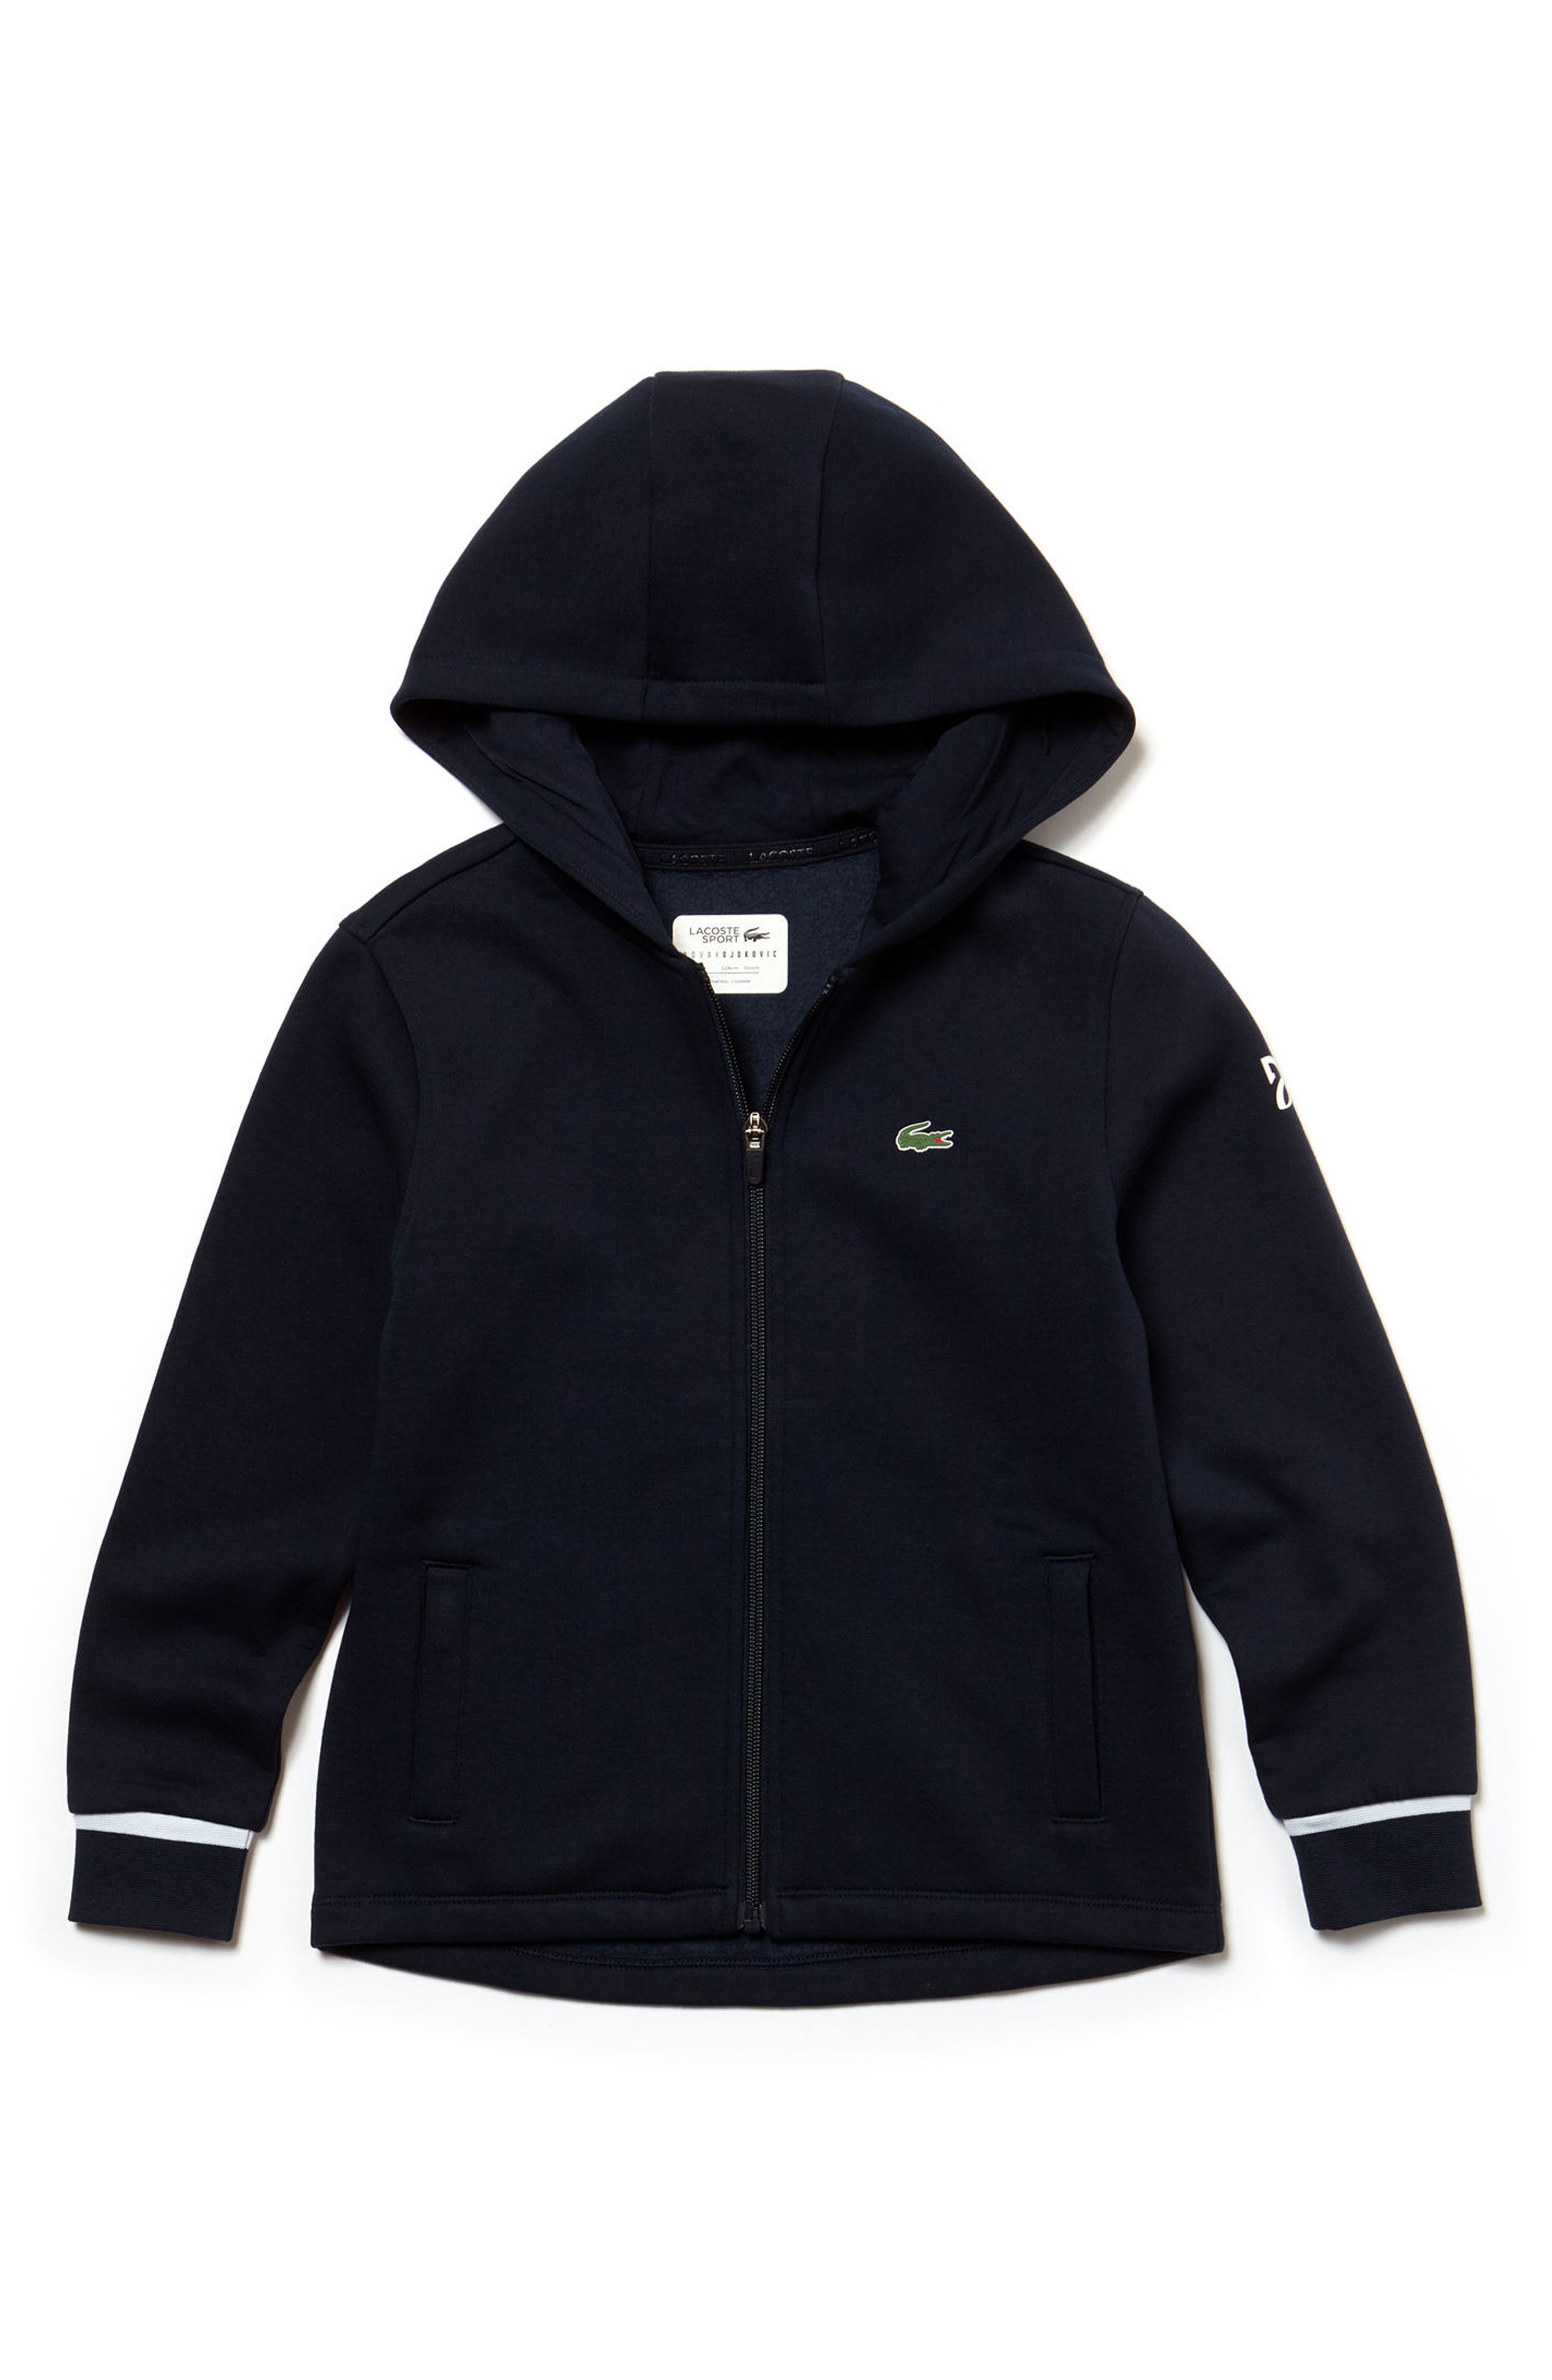 Fan Zip Hoodie,                         Main,                         color, Marino/ Black